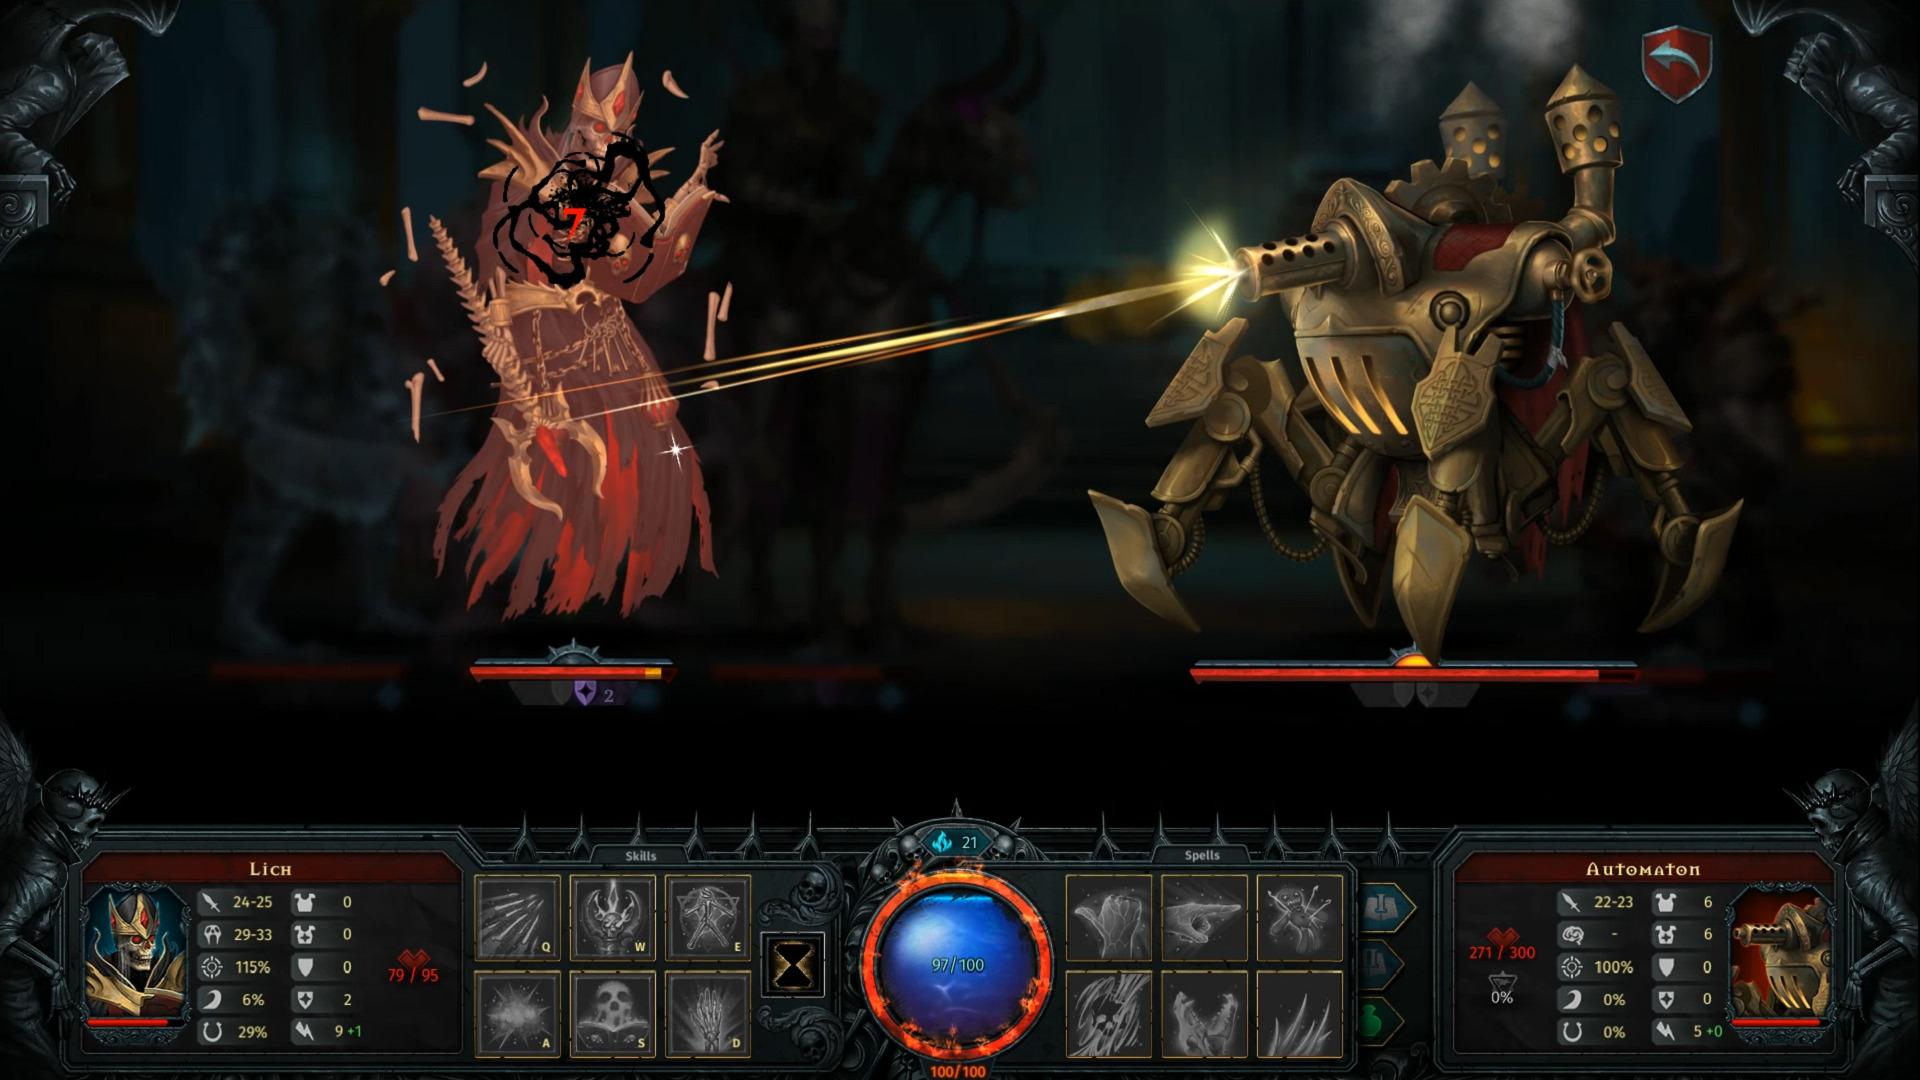 iratus-necromancer-edition-pc-screenshot-03